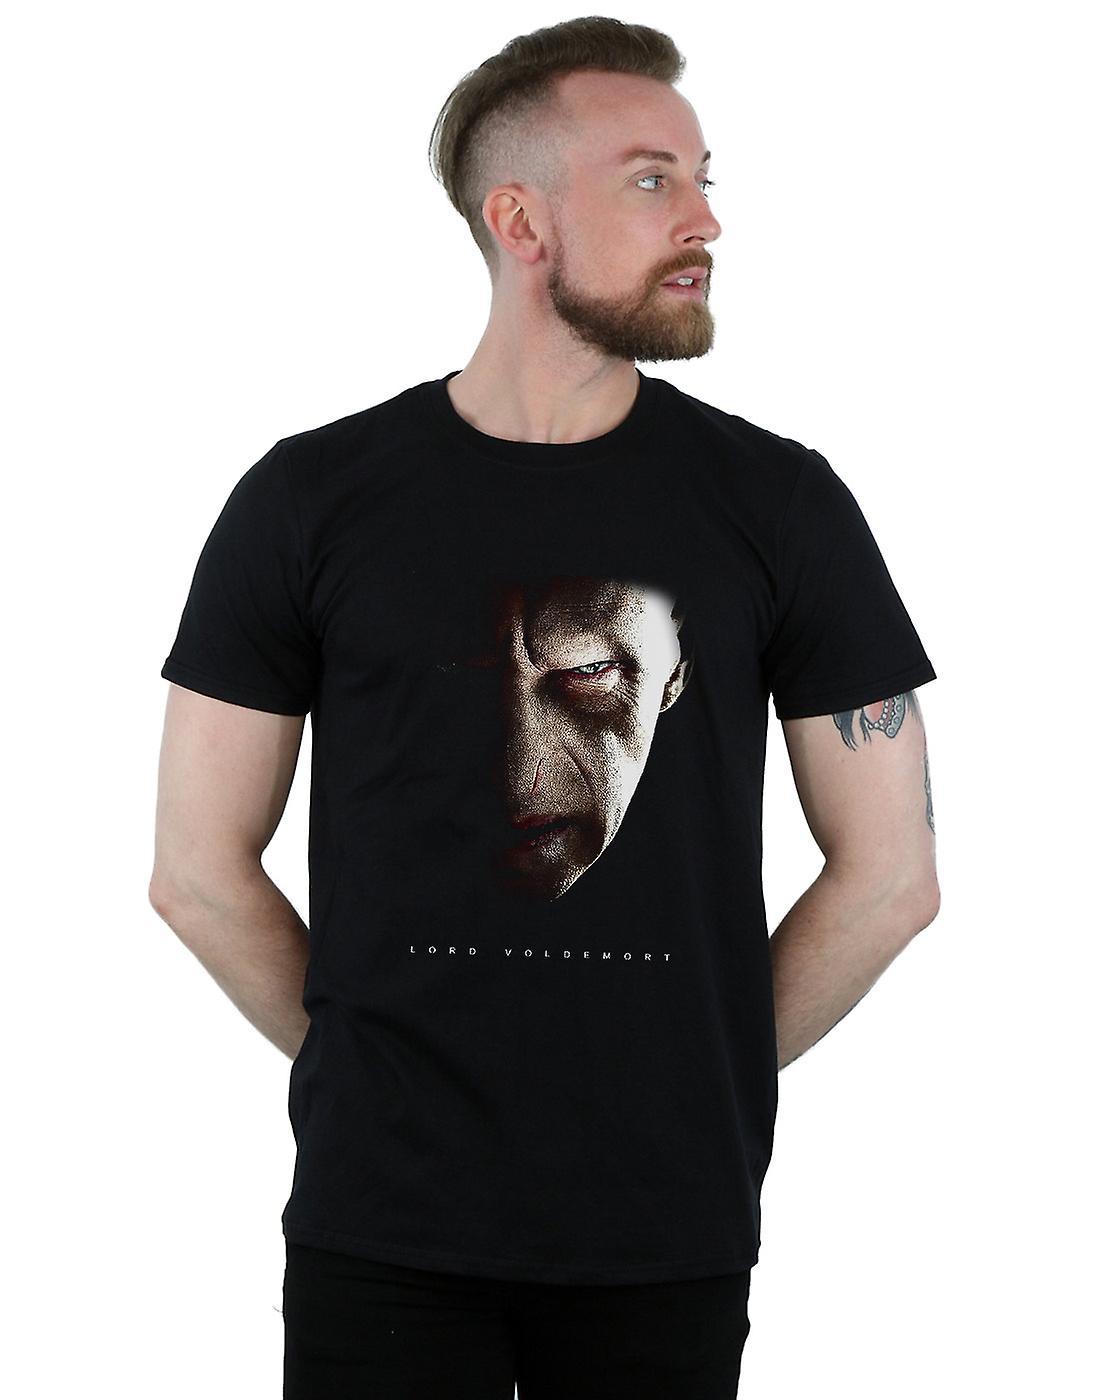 Harry Potter Men's Lord Voldemort Portrait T-Shirt